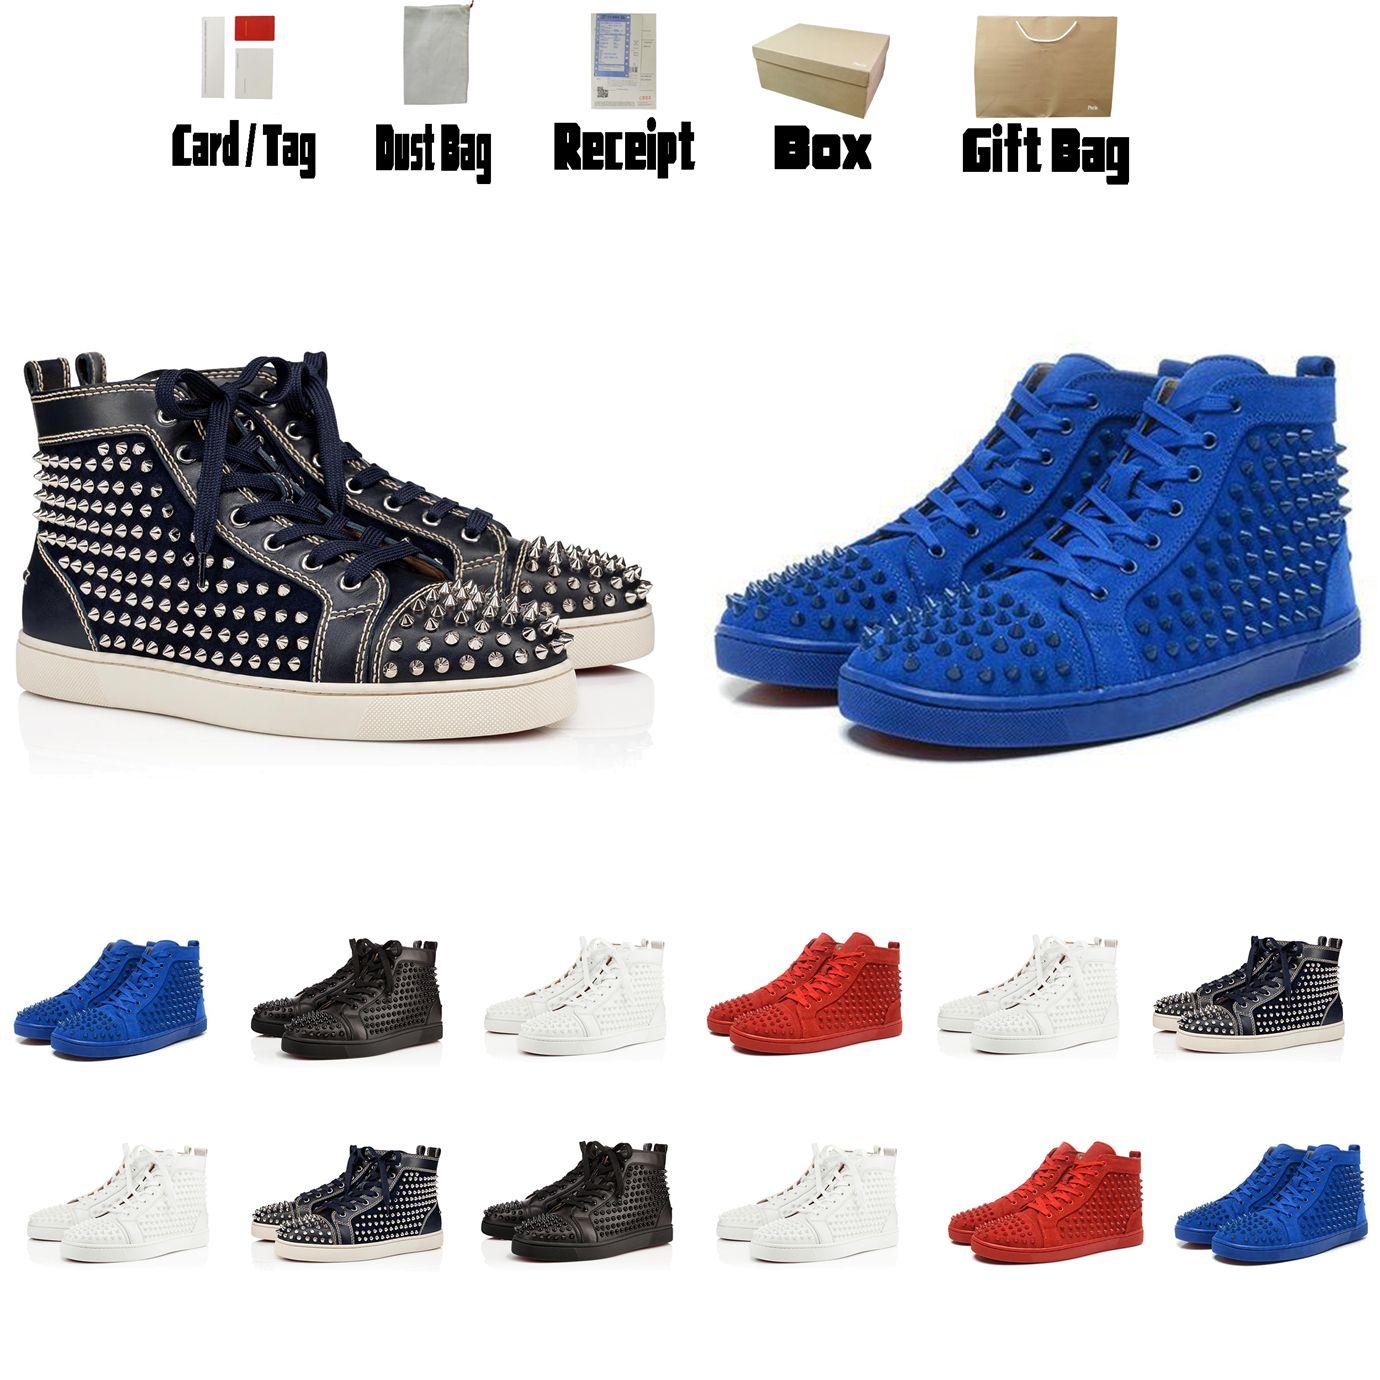 Botas Luxurys Designers Sapatos Vermelho Bottom Sneakers Homens High Top Top Top Mens Runner Mulheres Botas Planas Tamanho US5-US13